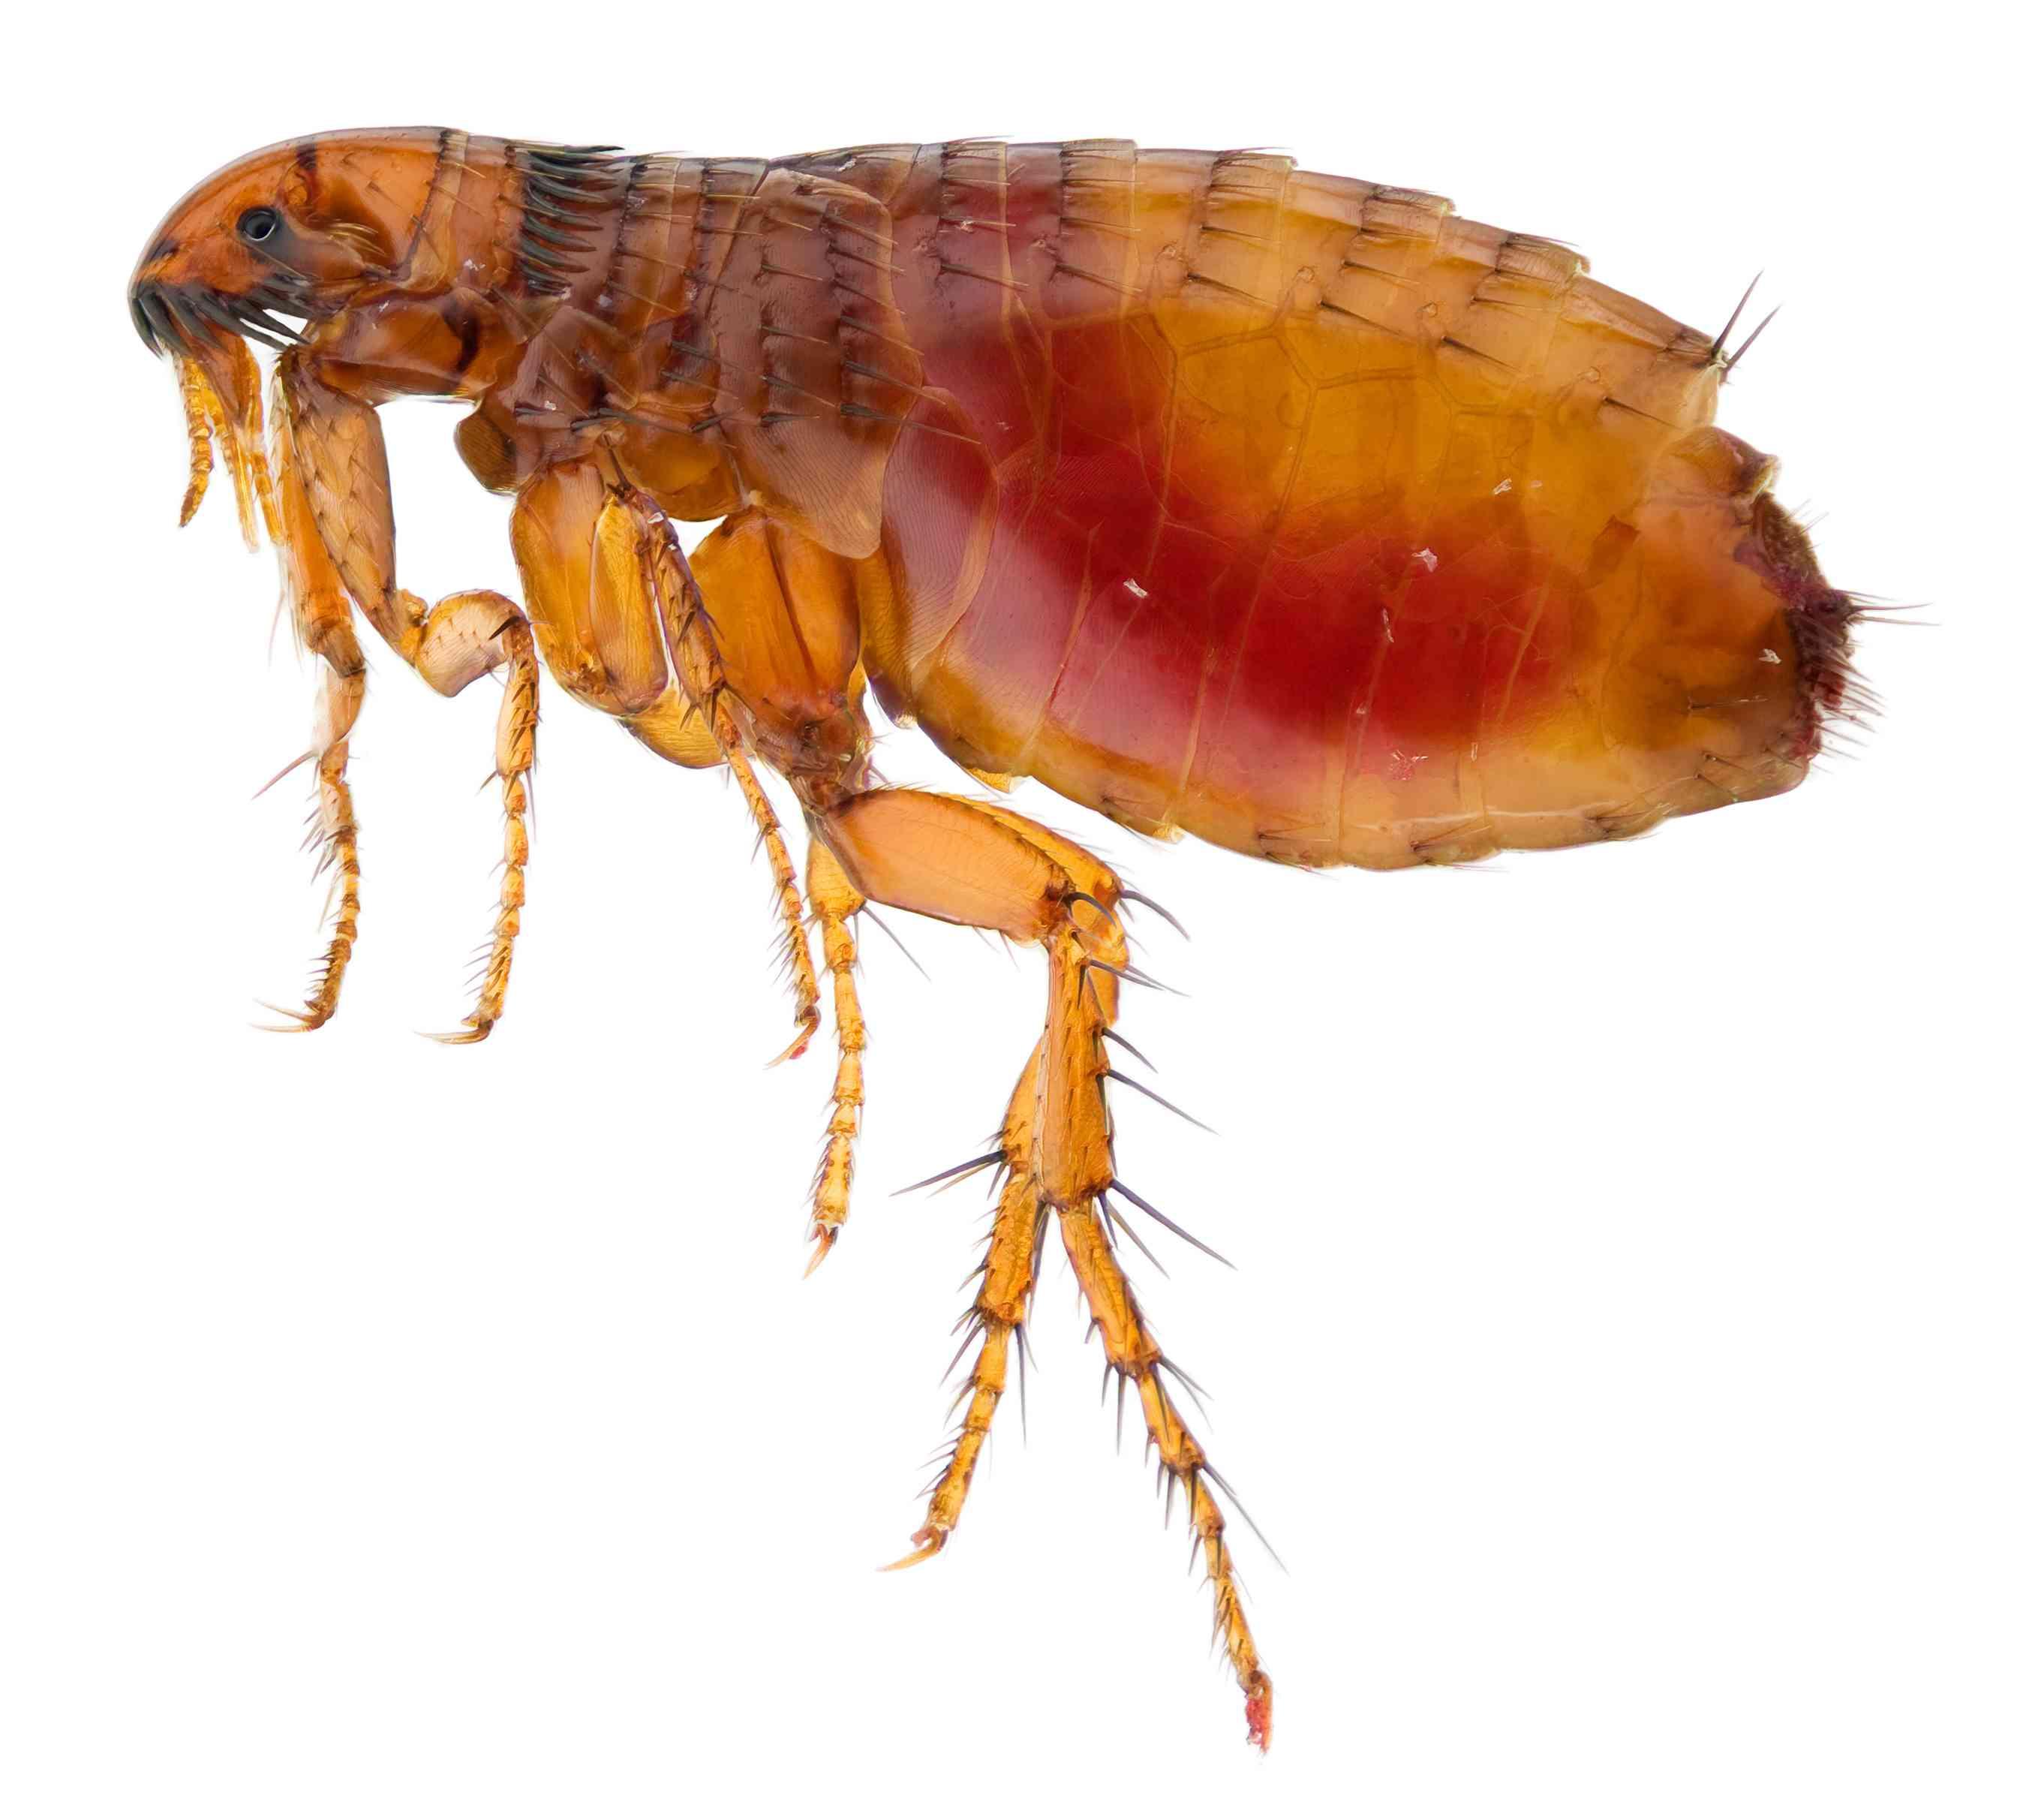 Up close image of a flea